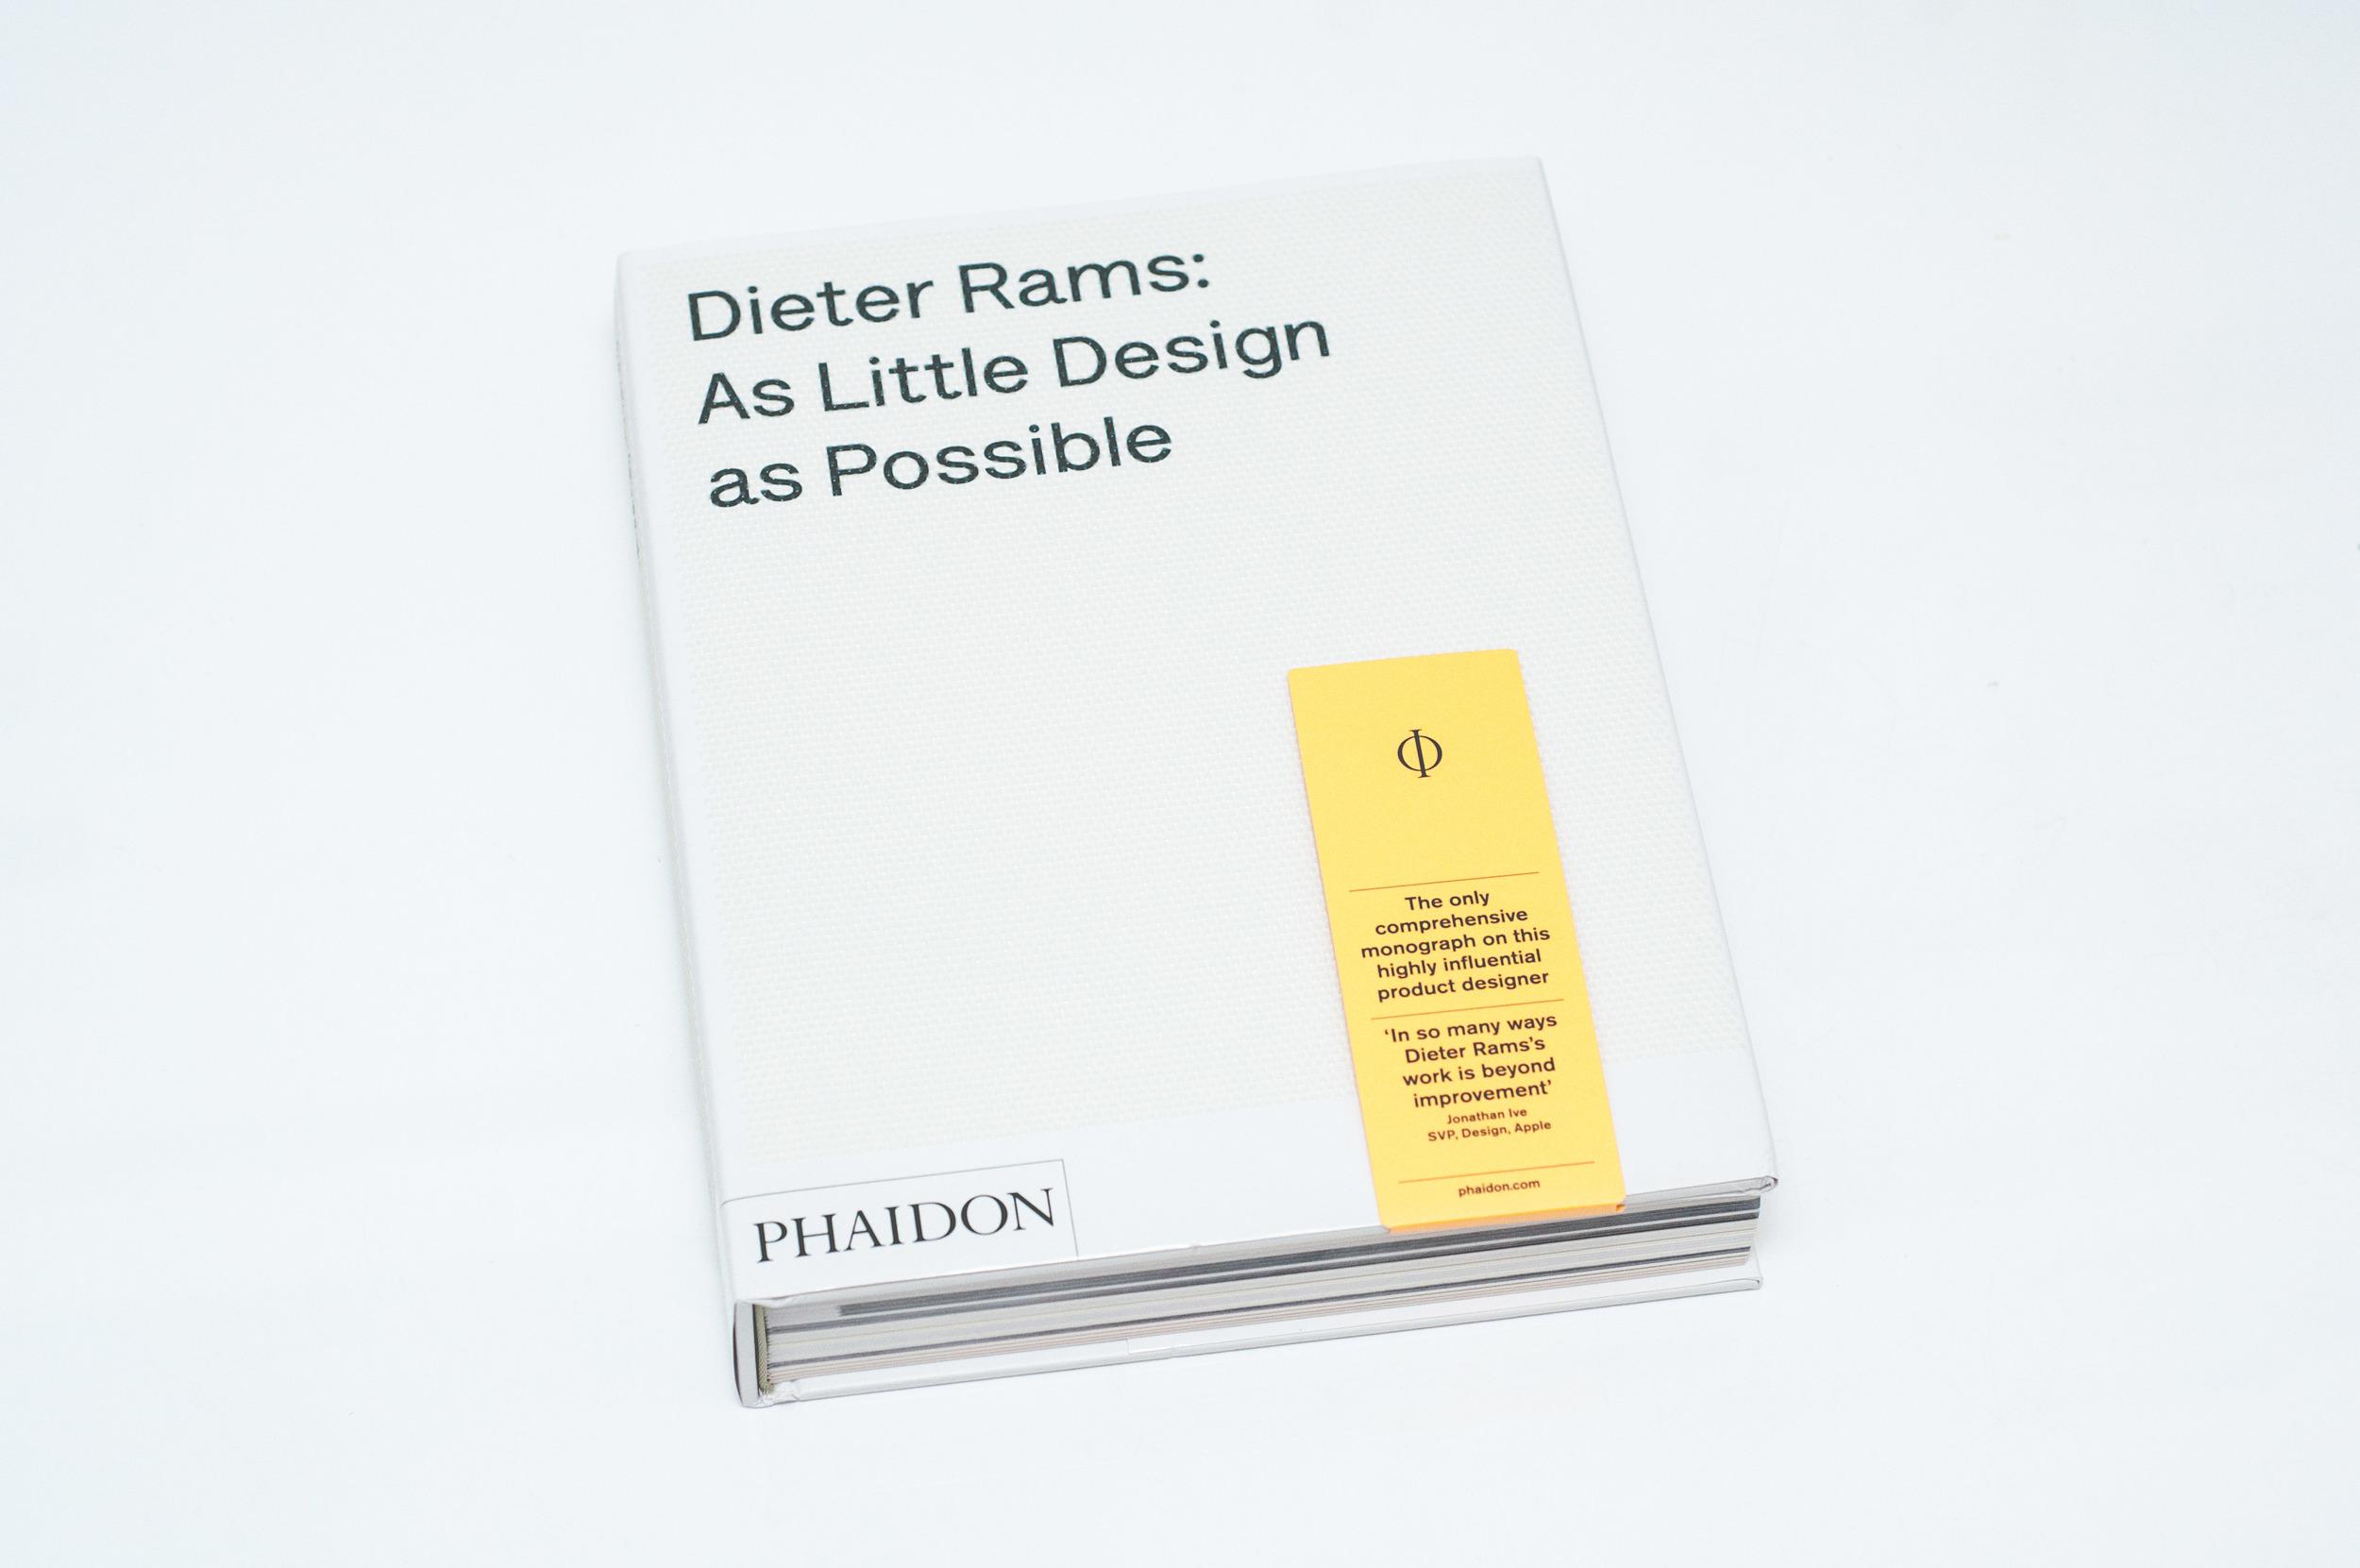 DieterRams-11.jpg